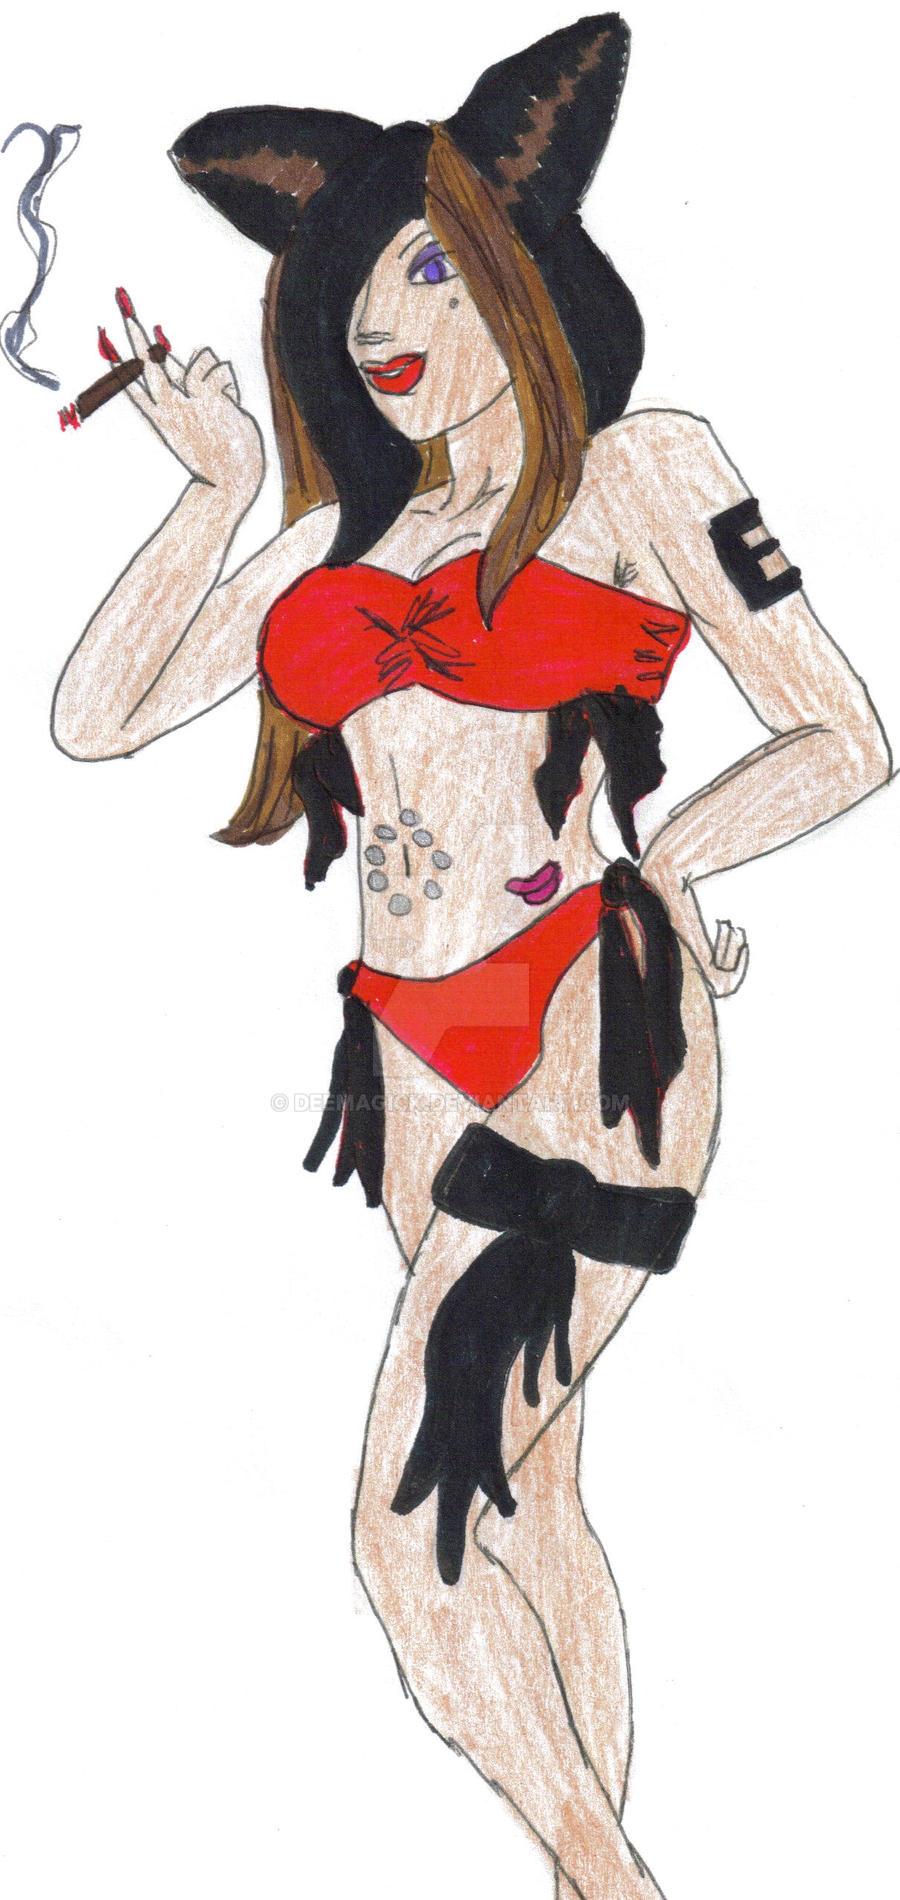 Elix's Bikini Shot by DeemagicK